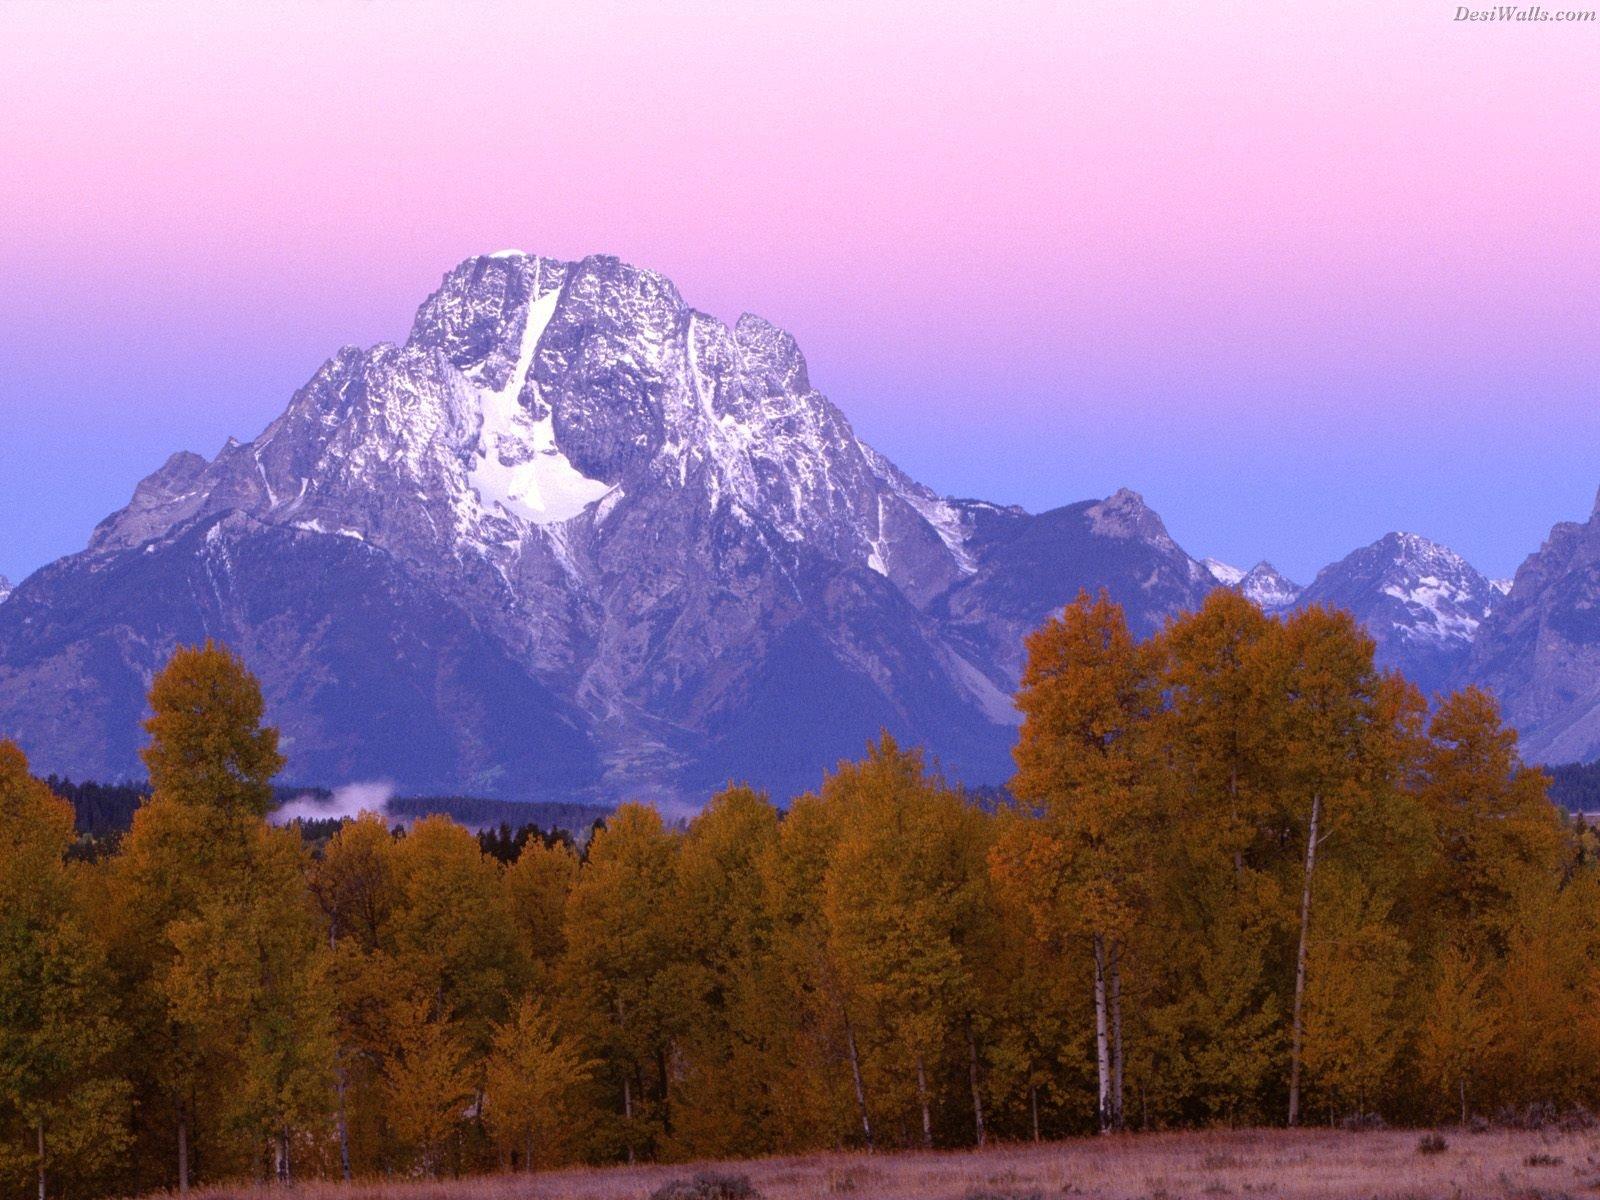 http://2.bp.blogspot.com/_ogwIpm0sO18/TNVE_iUo9dI/AAAAAAAAHGo/avYMupqFHAc/s1600/Silk+Finish+%E2%80%93+Grand+Teton+National+Park+Of+Wyoming+Wallpaper.jpg